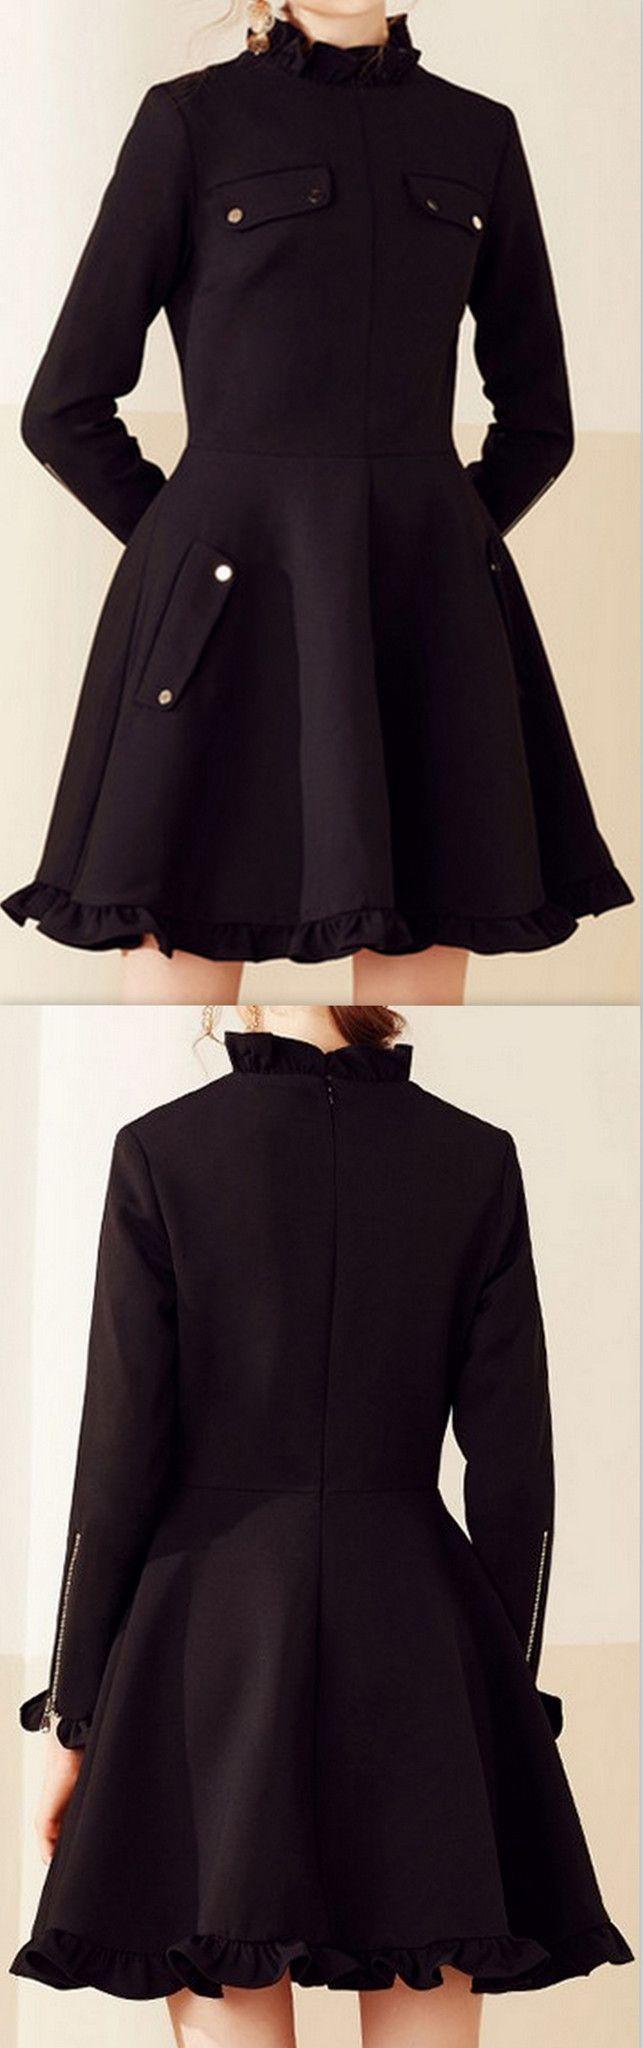 Black Long-Sleeve Ruffle Trim Mini Dress